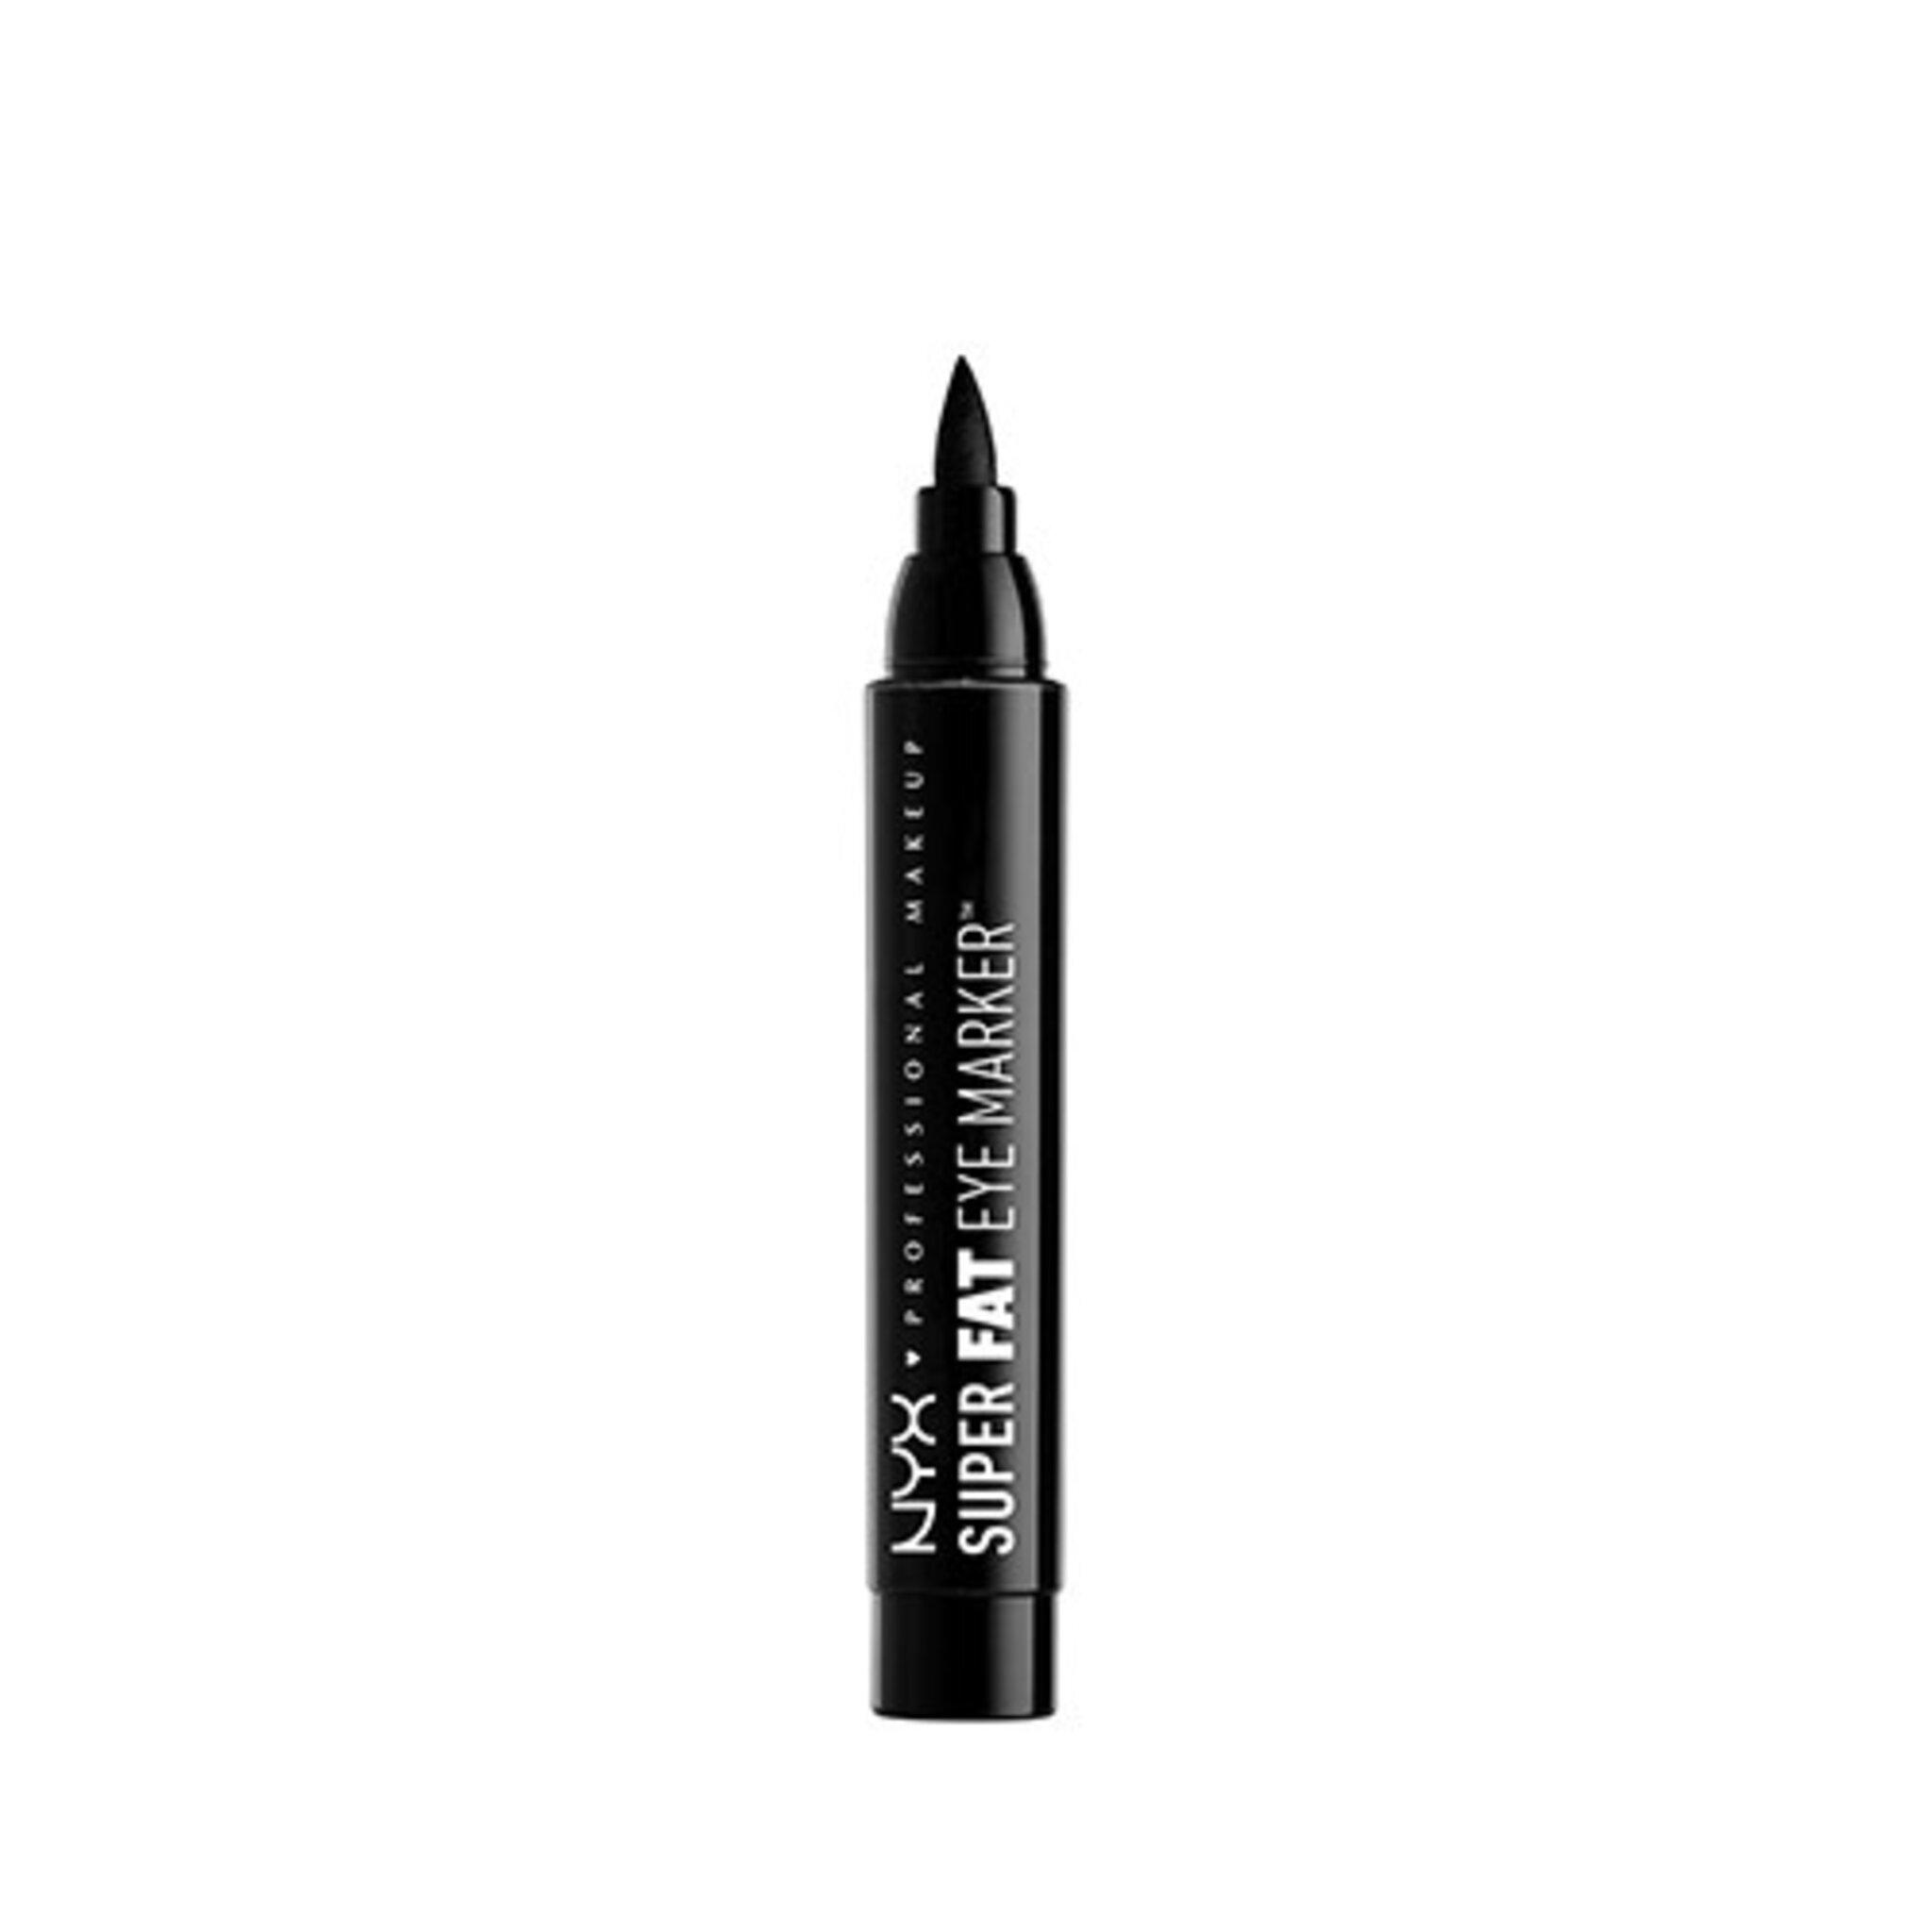 Super Fat Eye Marker Eyeliner, 2,5 ML